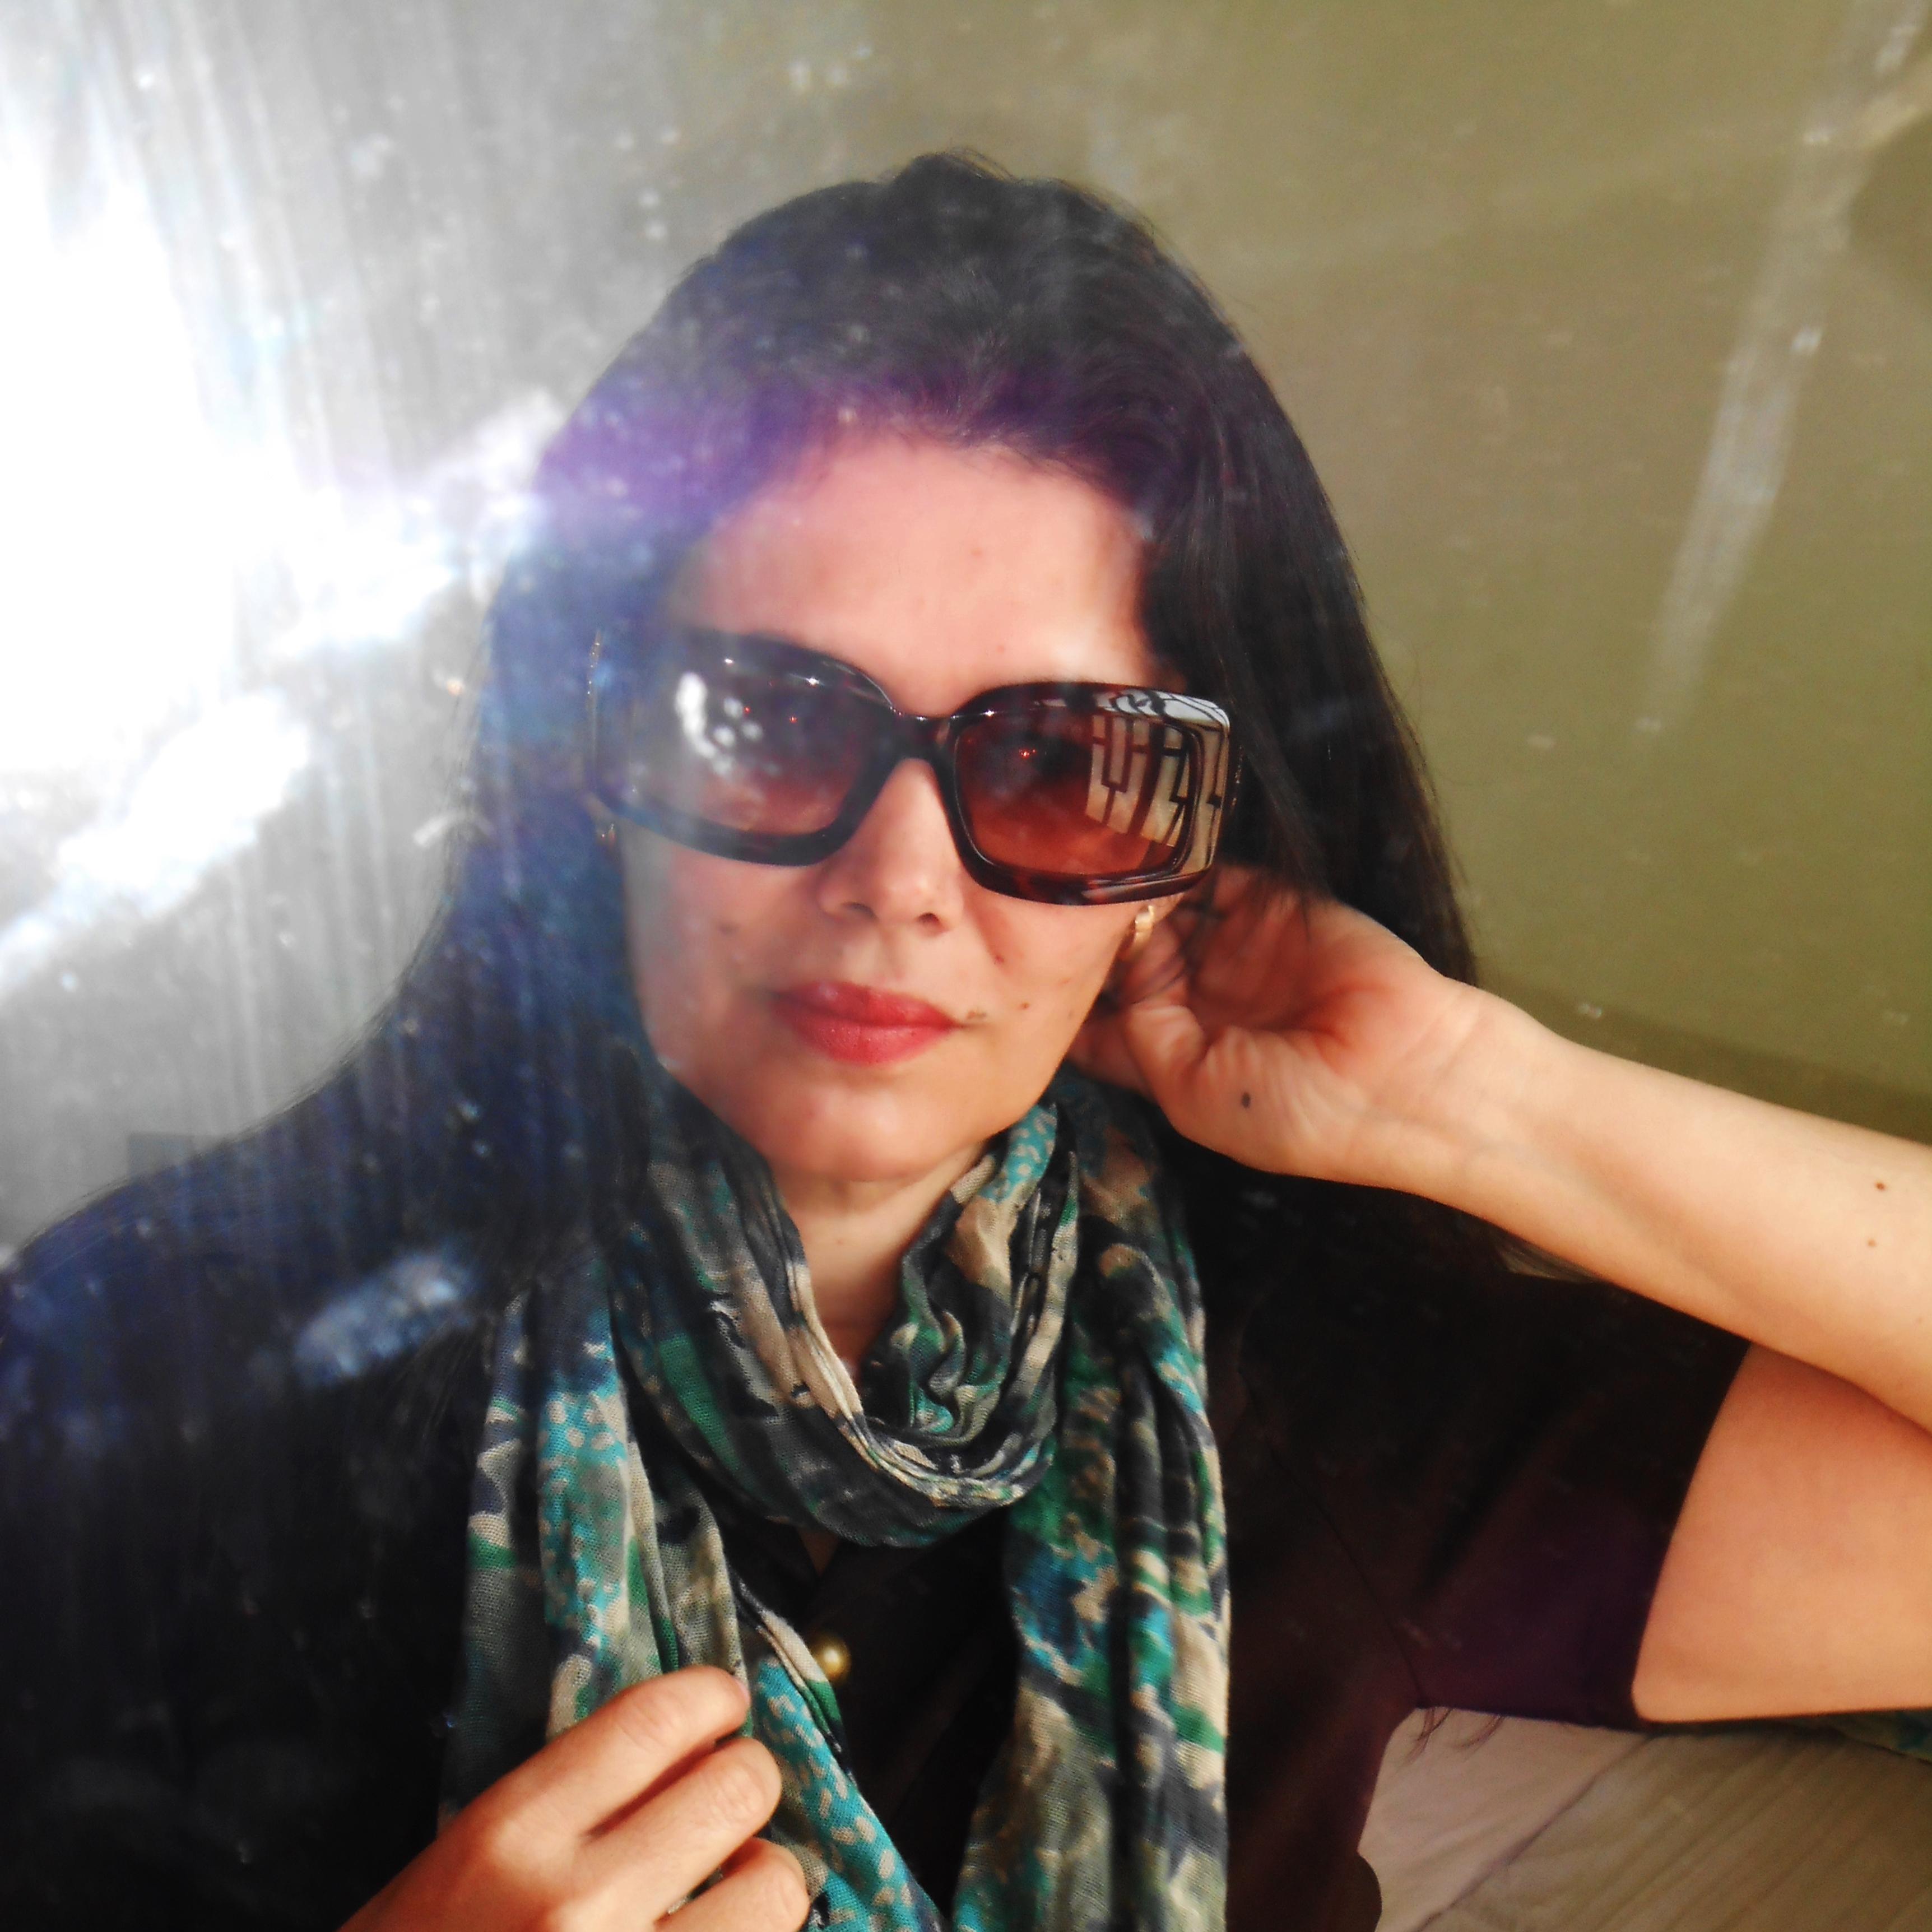 Eleúzia Lins da Silva